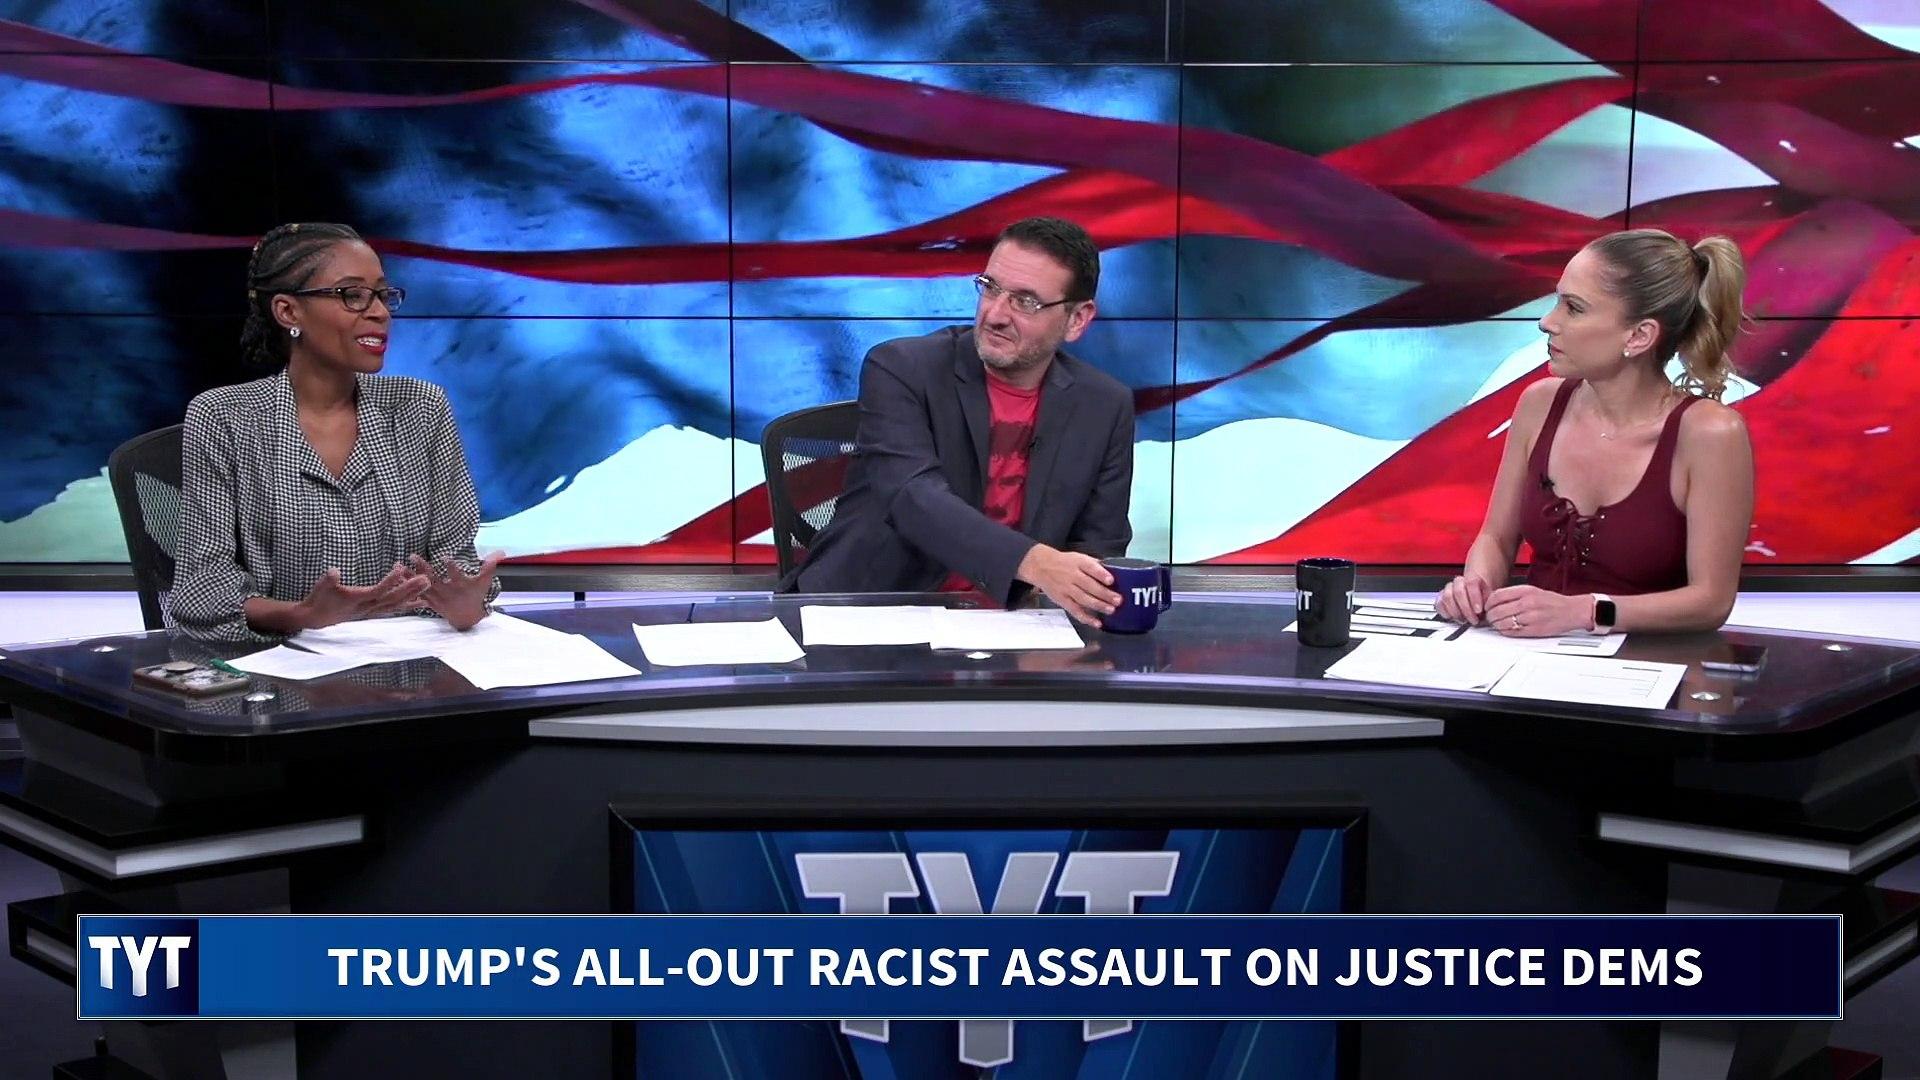 Trump's Racist Assault On Justice Democrats